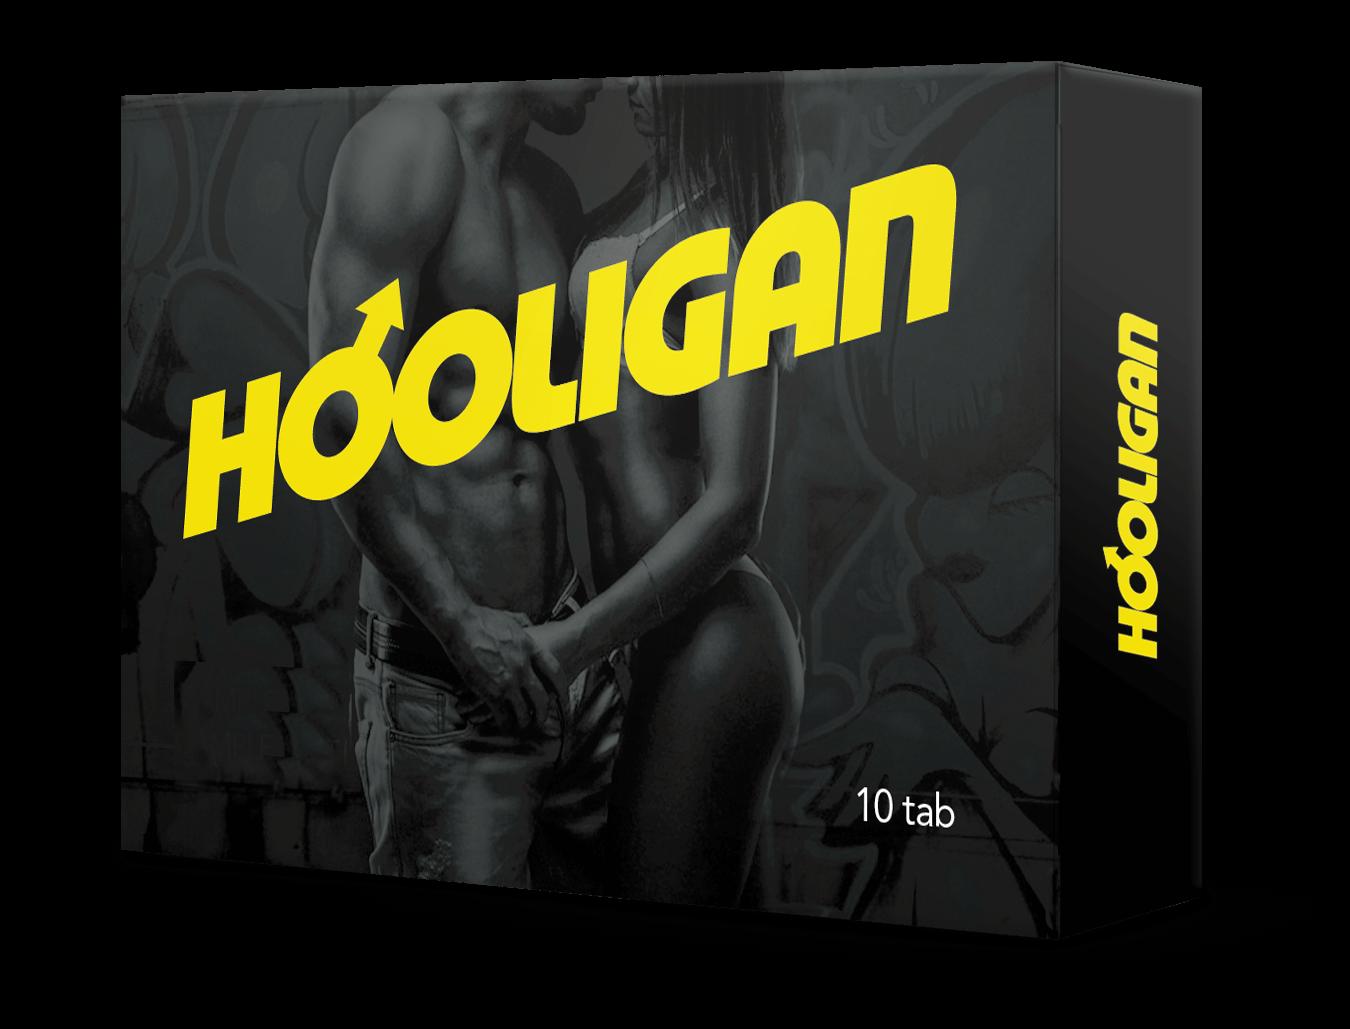 Hooligan - วิธีใช้ - ดีไหม - คือ